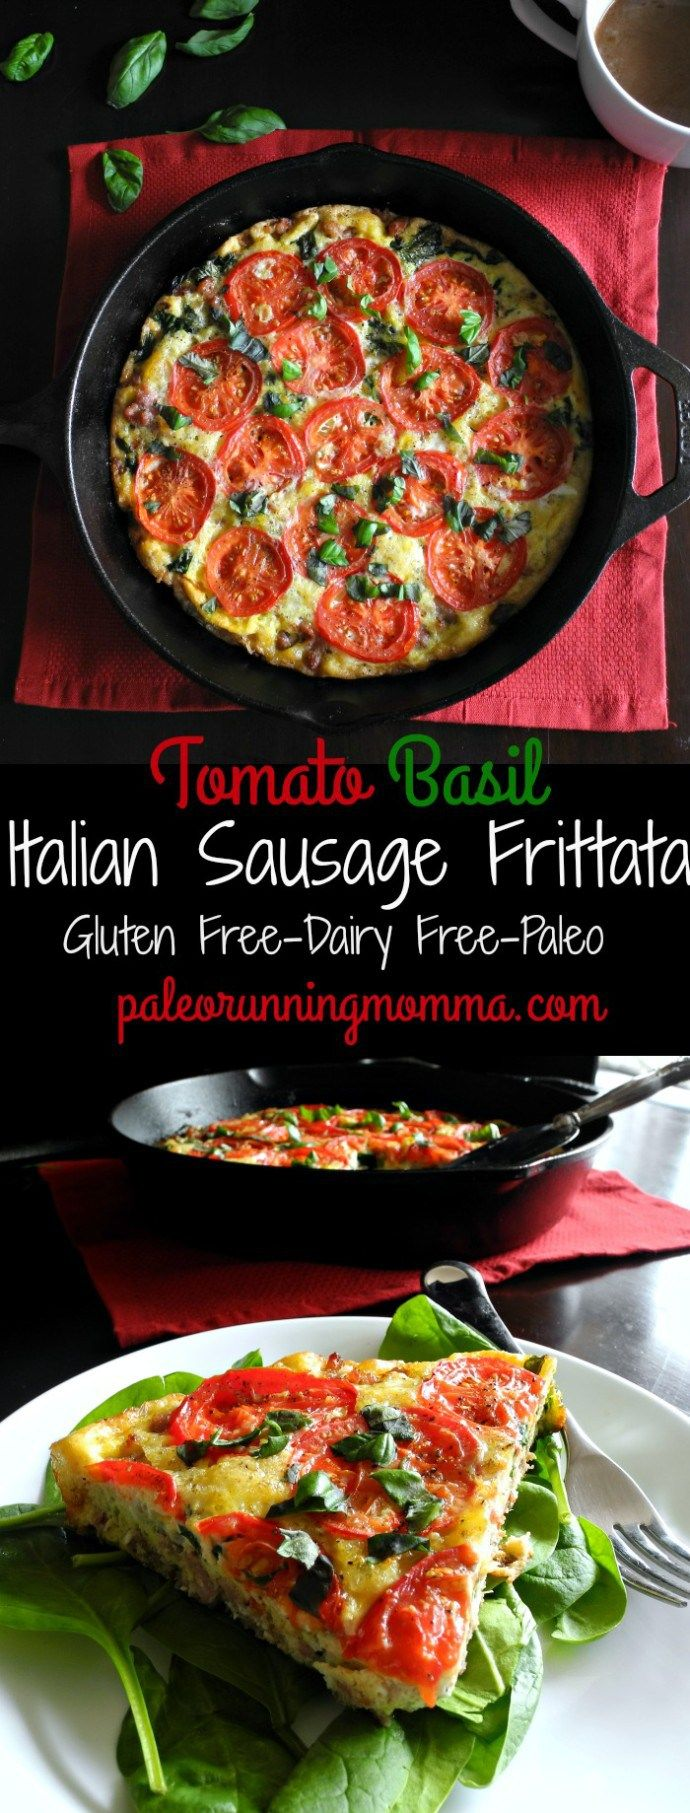 Tomato Basil Italian Sausage Frittata #glutenfree #dairyfree #paleo #whole30